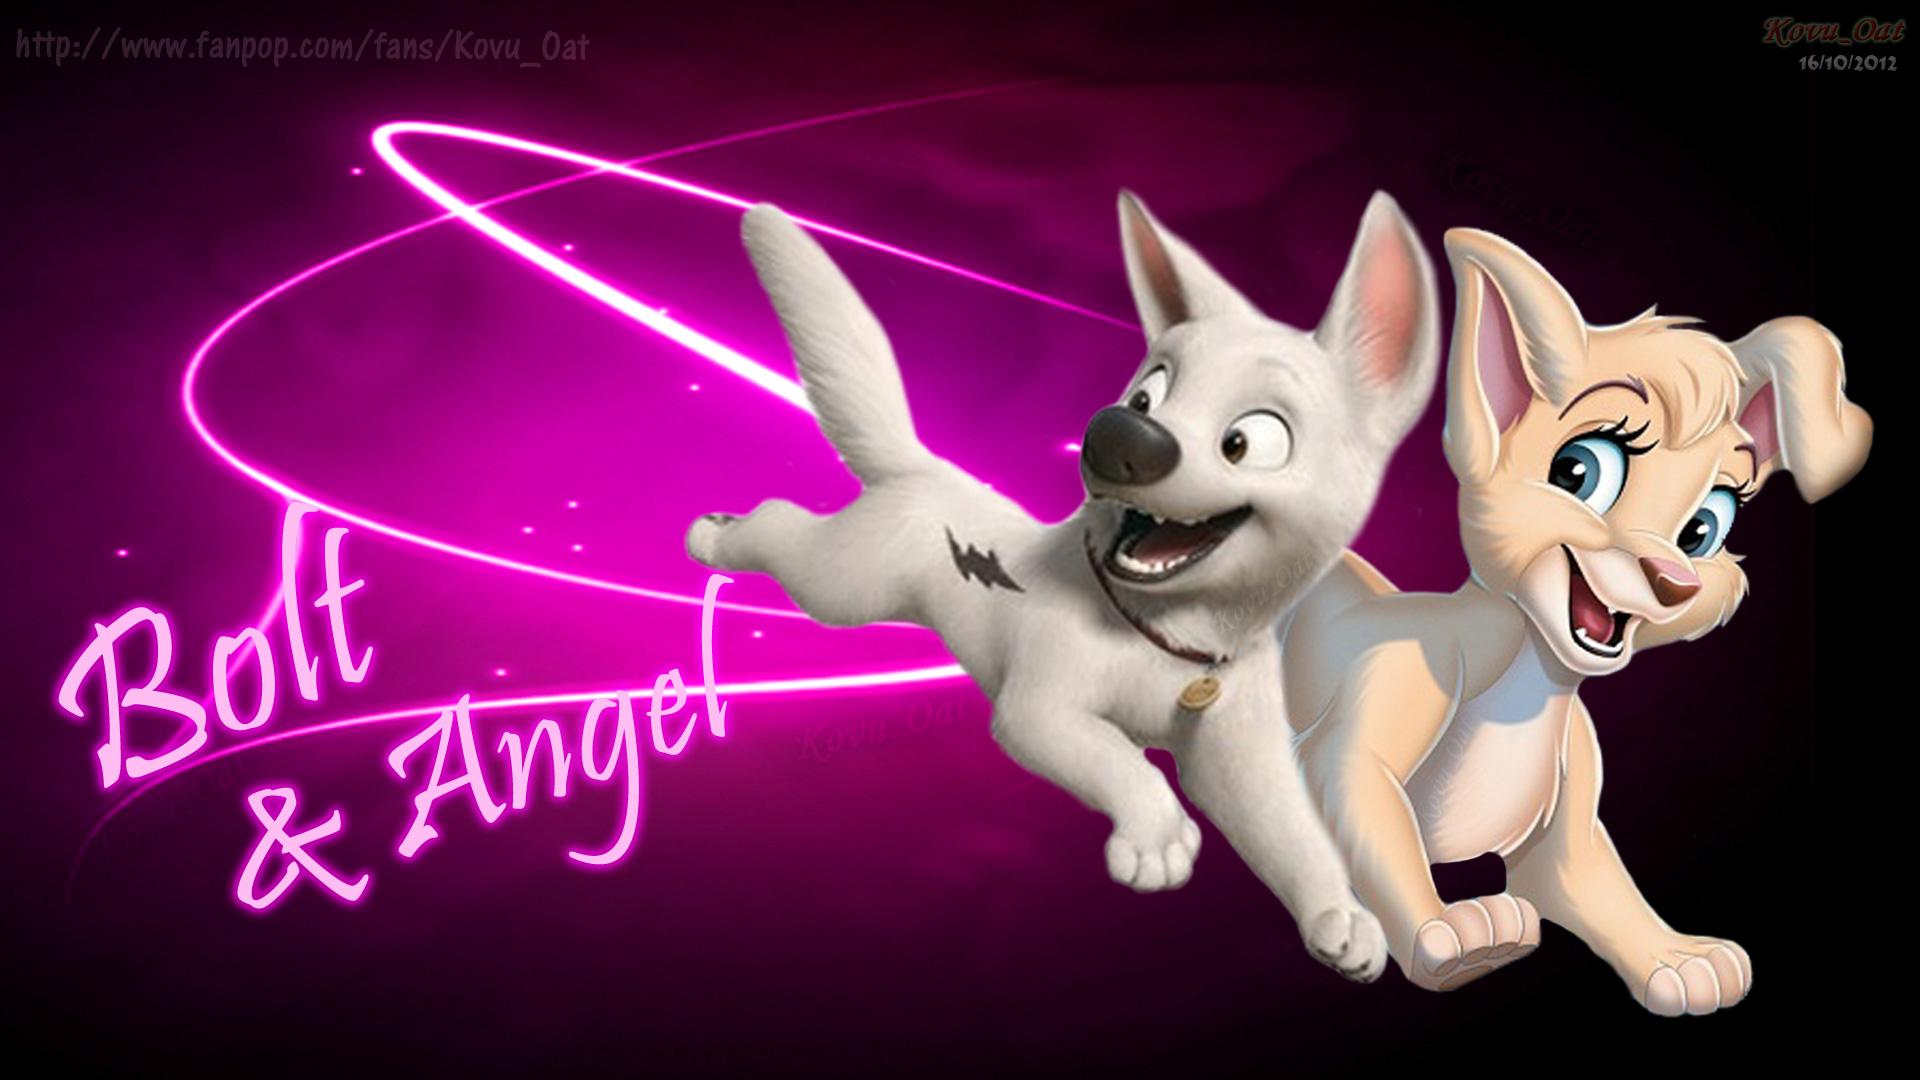 Disney Bolt dog and Angel Lady Tramp HD   Kovu Oat Wallpaper 32492587 1920x1080